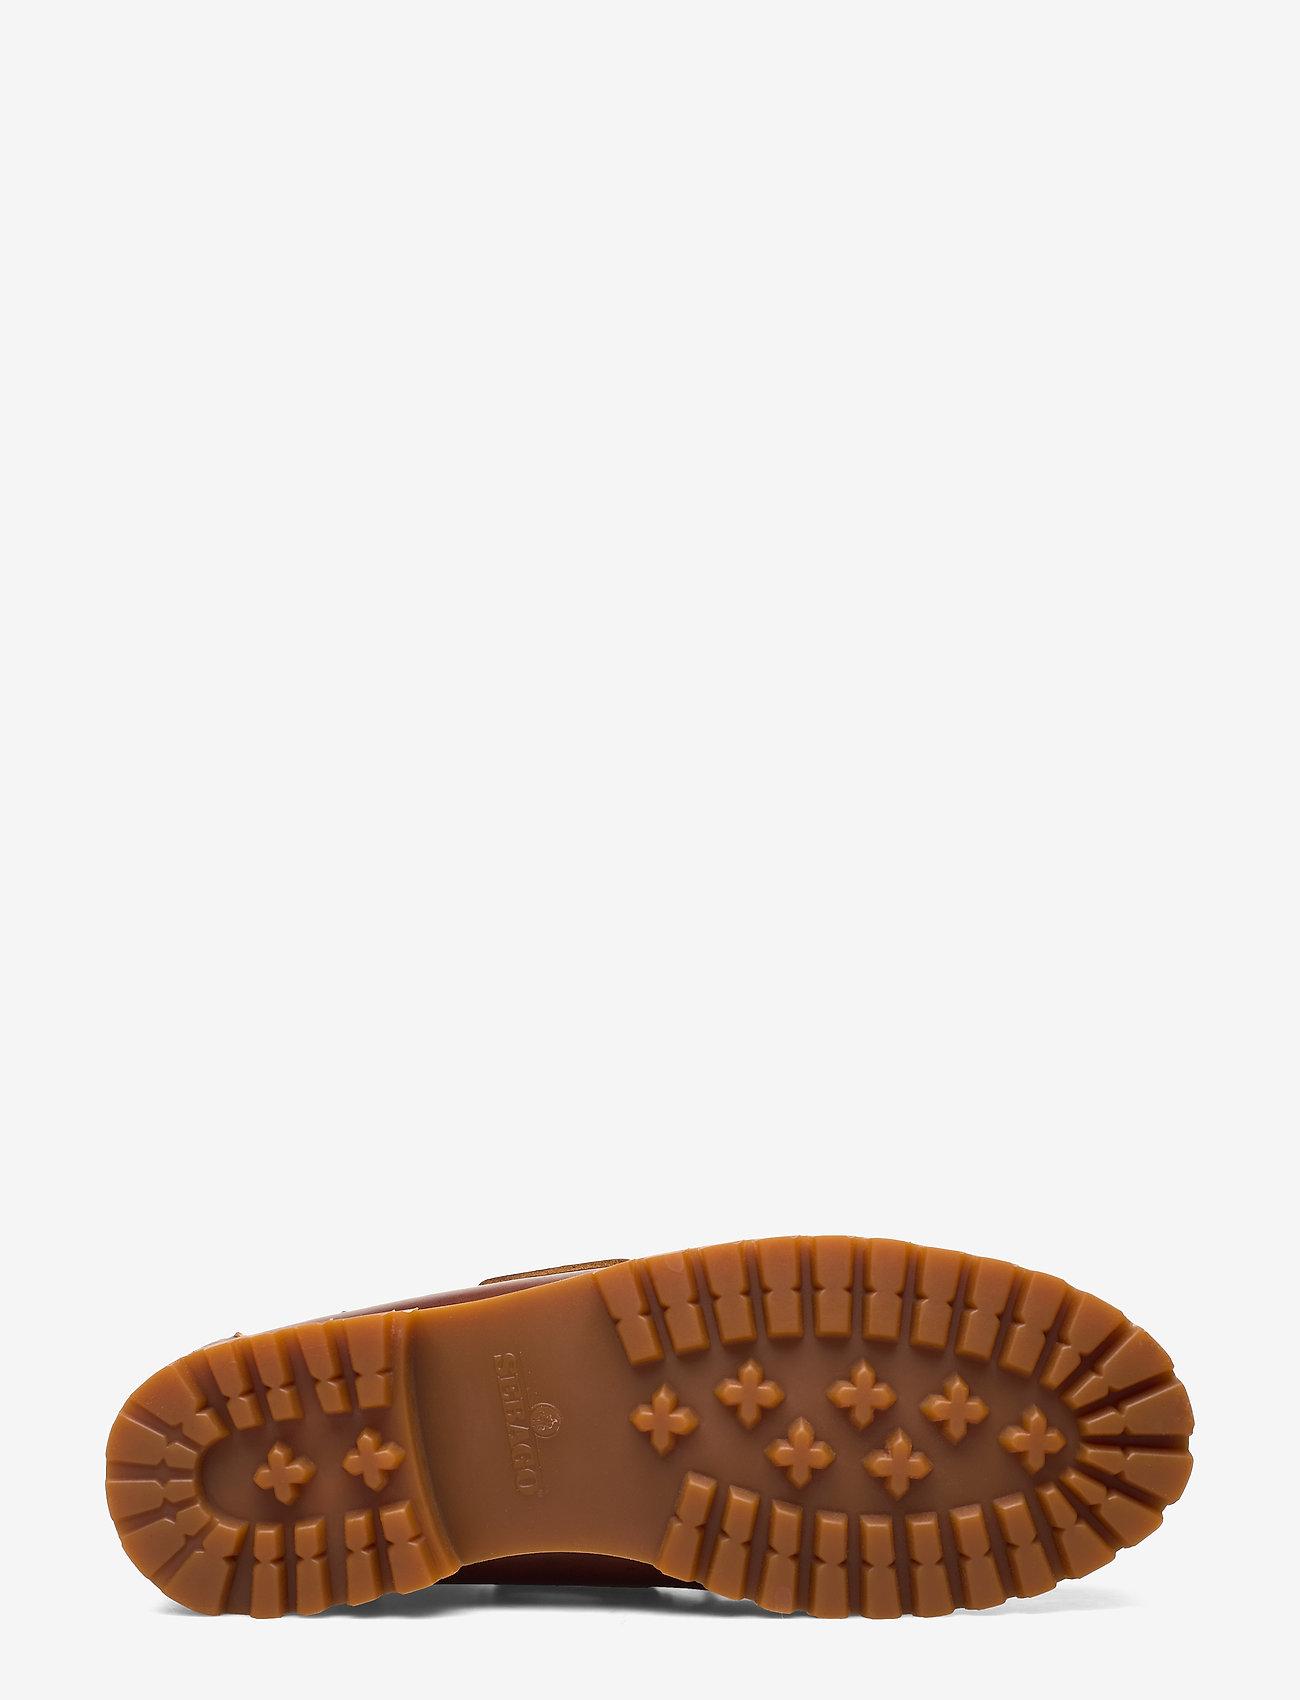 Acadia (Brown Cinnamon) - Sebago